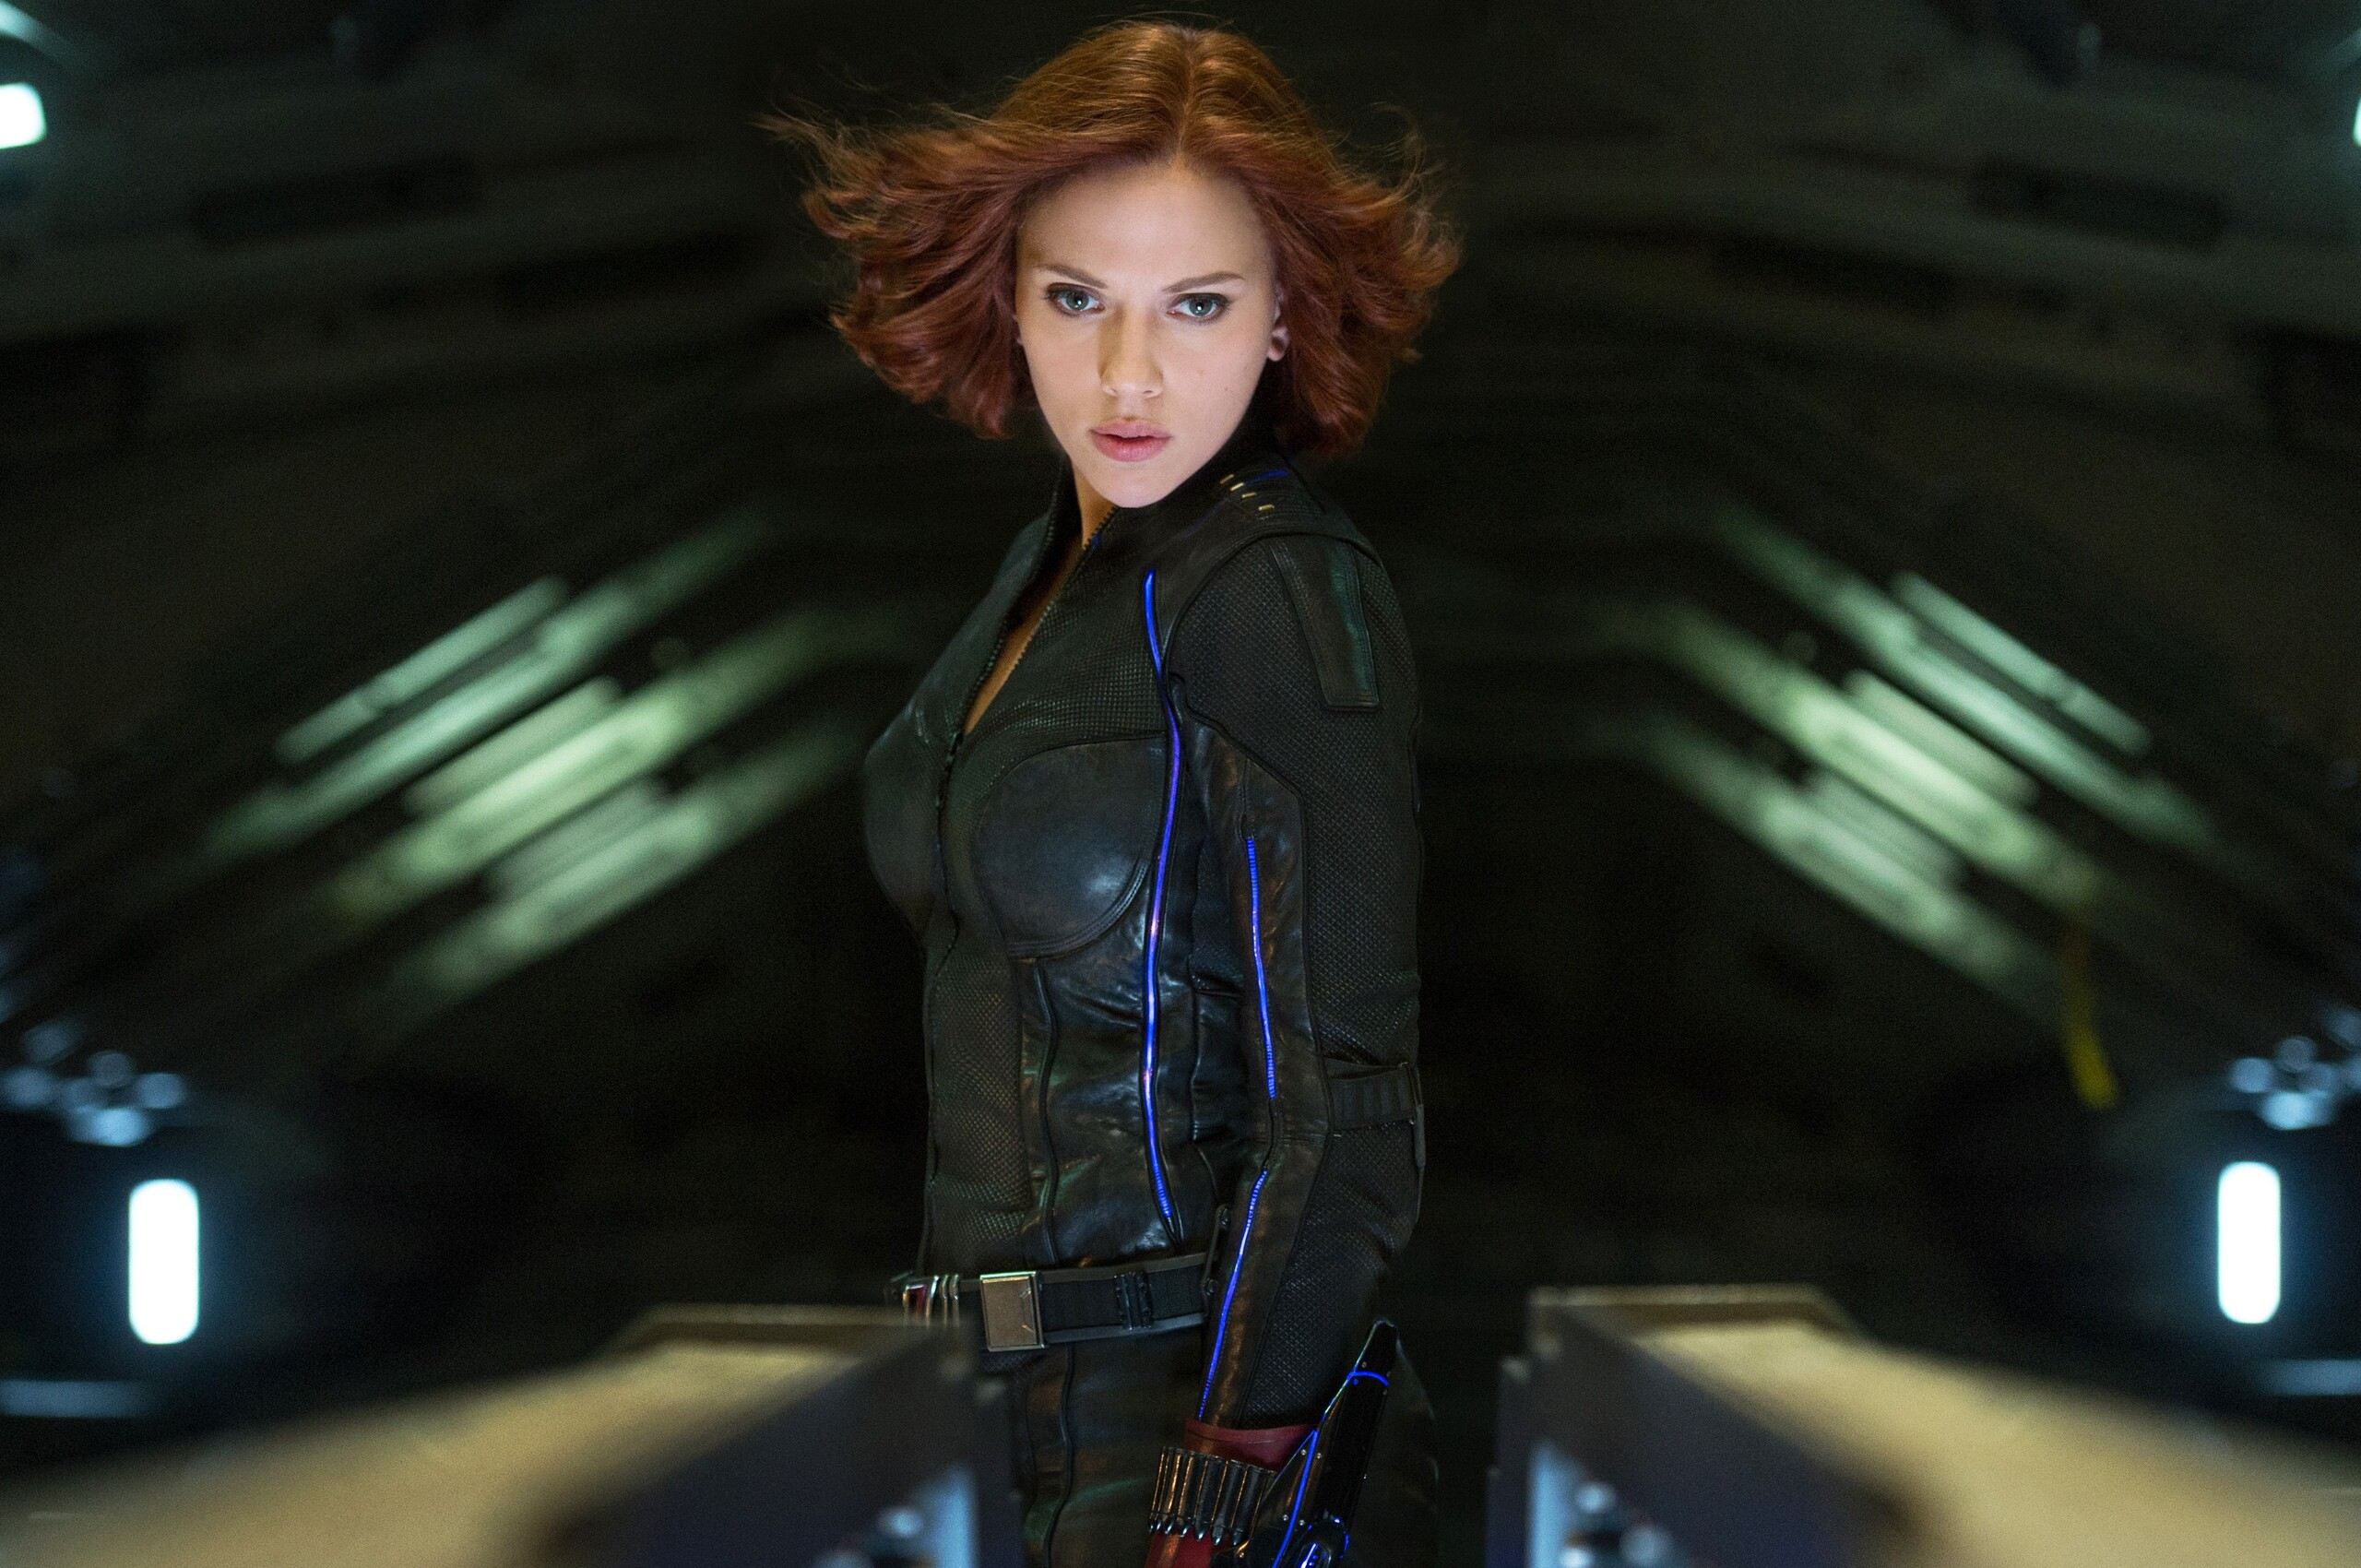 2560x1700 Scarlett Johansson Avengers Chromebook Pixel HD 4k